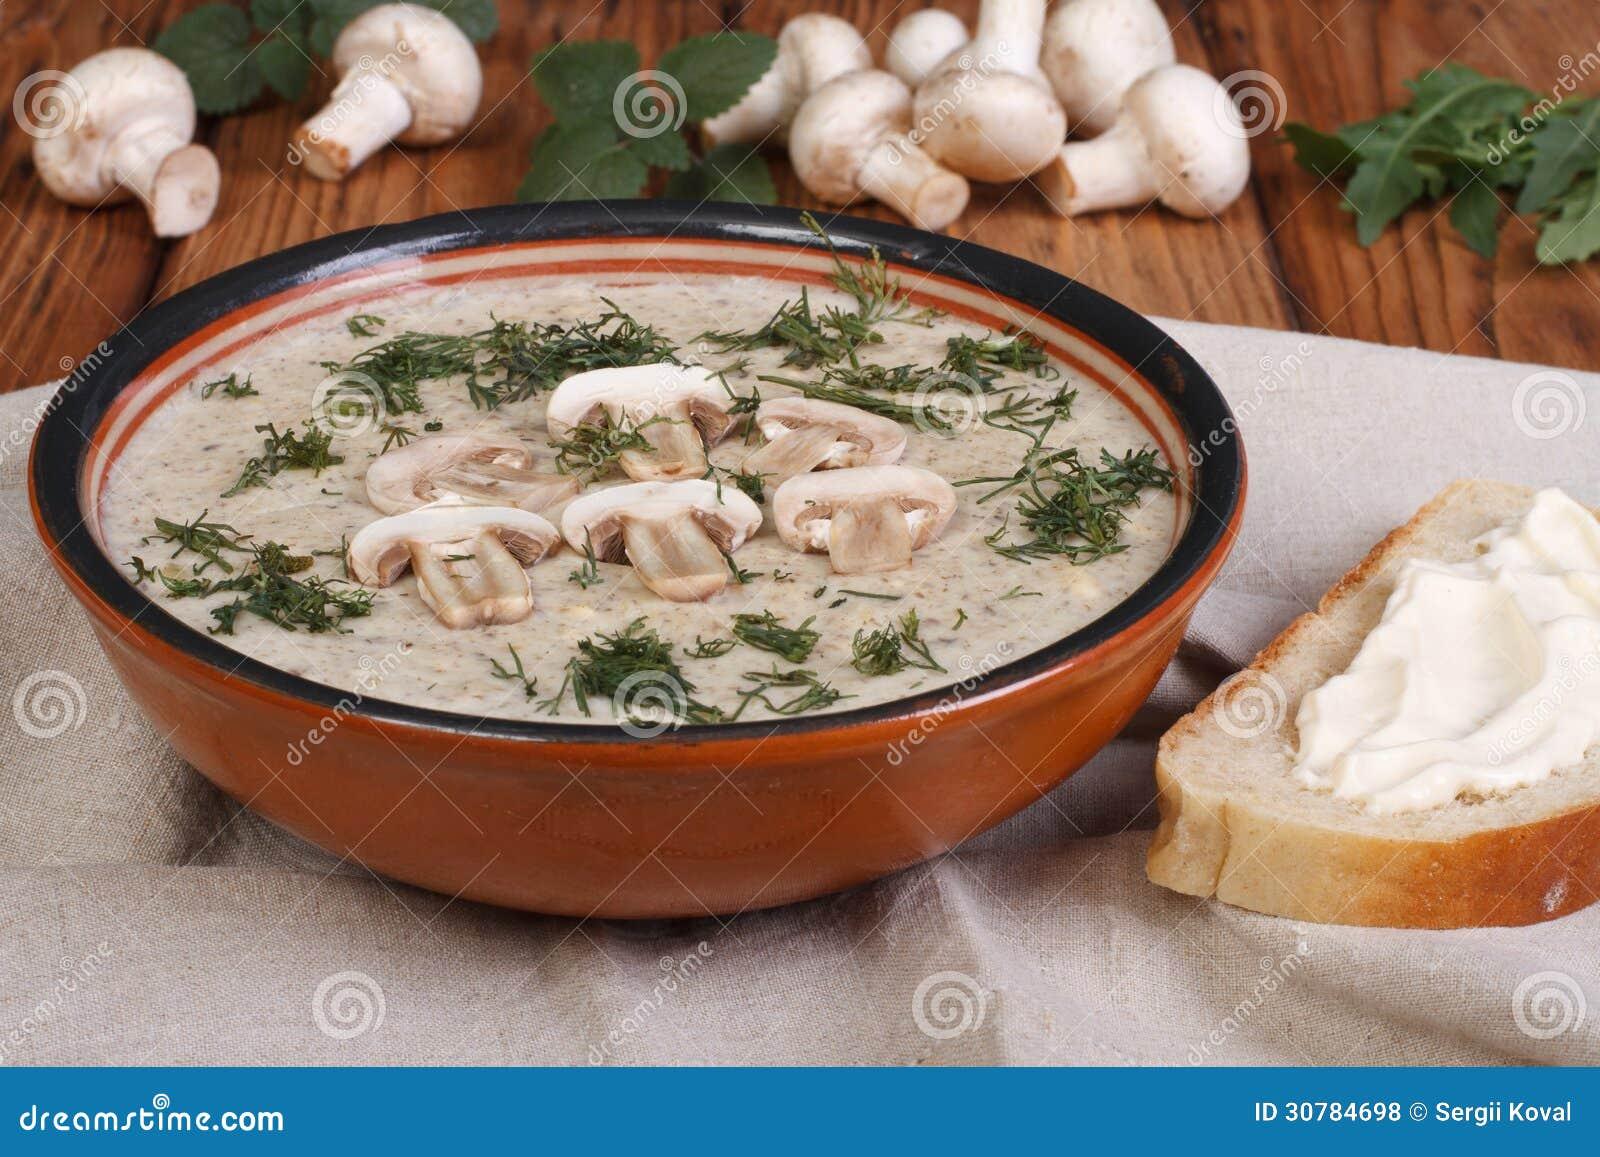 Mushroom cream soup with mushrooms and milk cream with herbs.